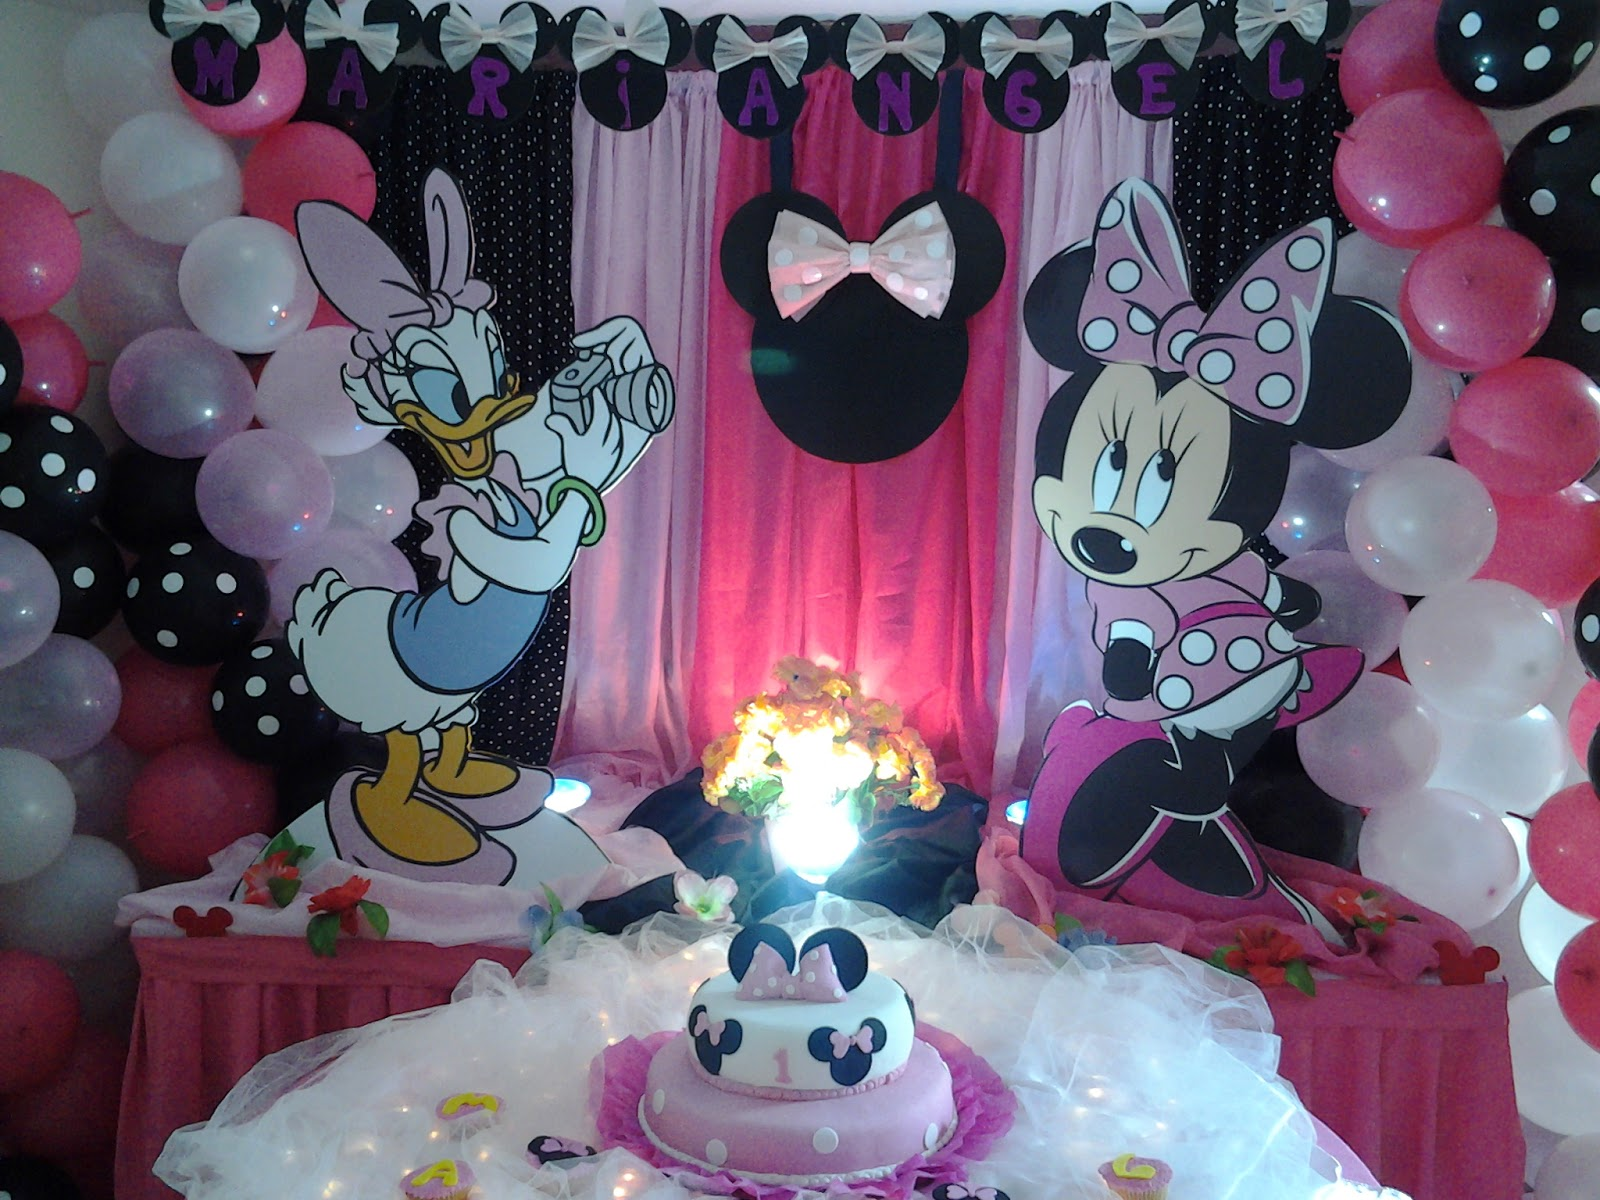 Pkelandia fiesta de minnie mouse cumplea os de mariangel for Decoracion para pared para cumpleanos